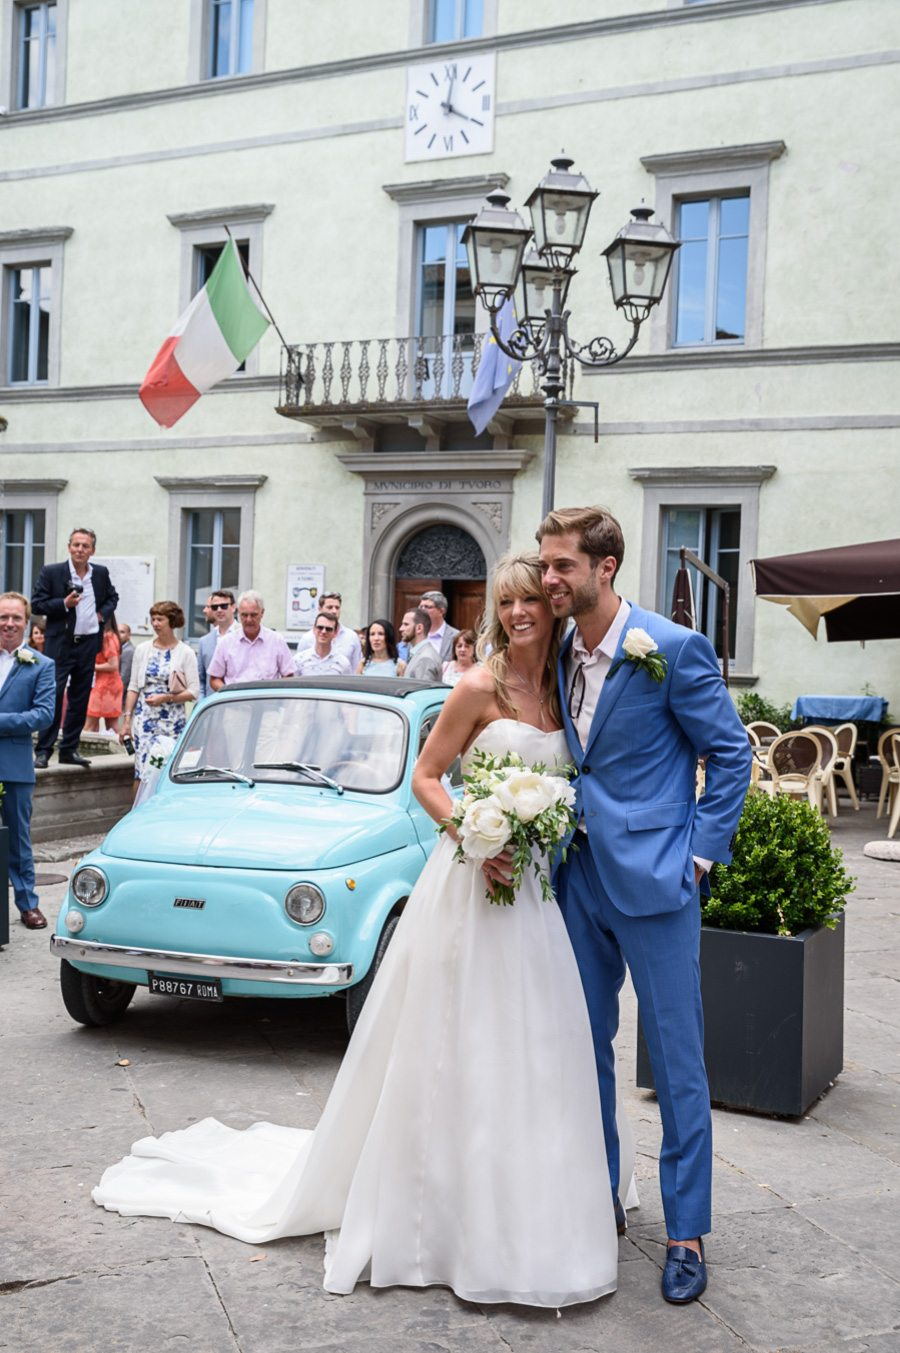 Wedding in Umbria – Louise and Daniel